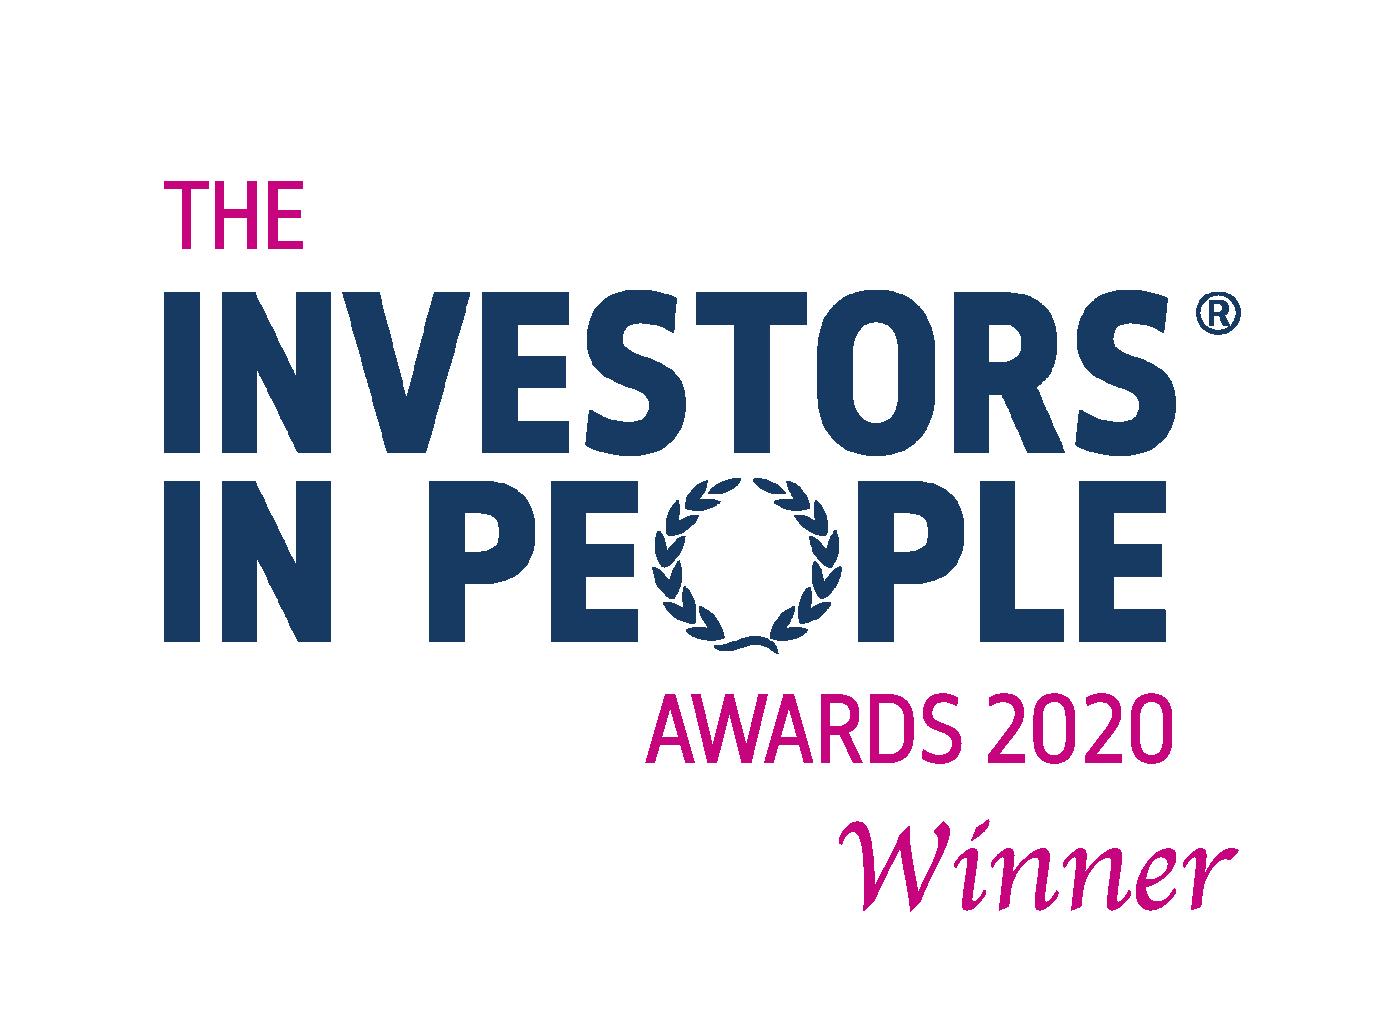 Onecom wins IIP Leadership and Management Award